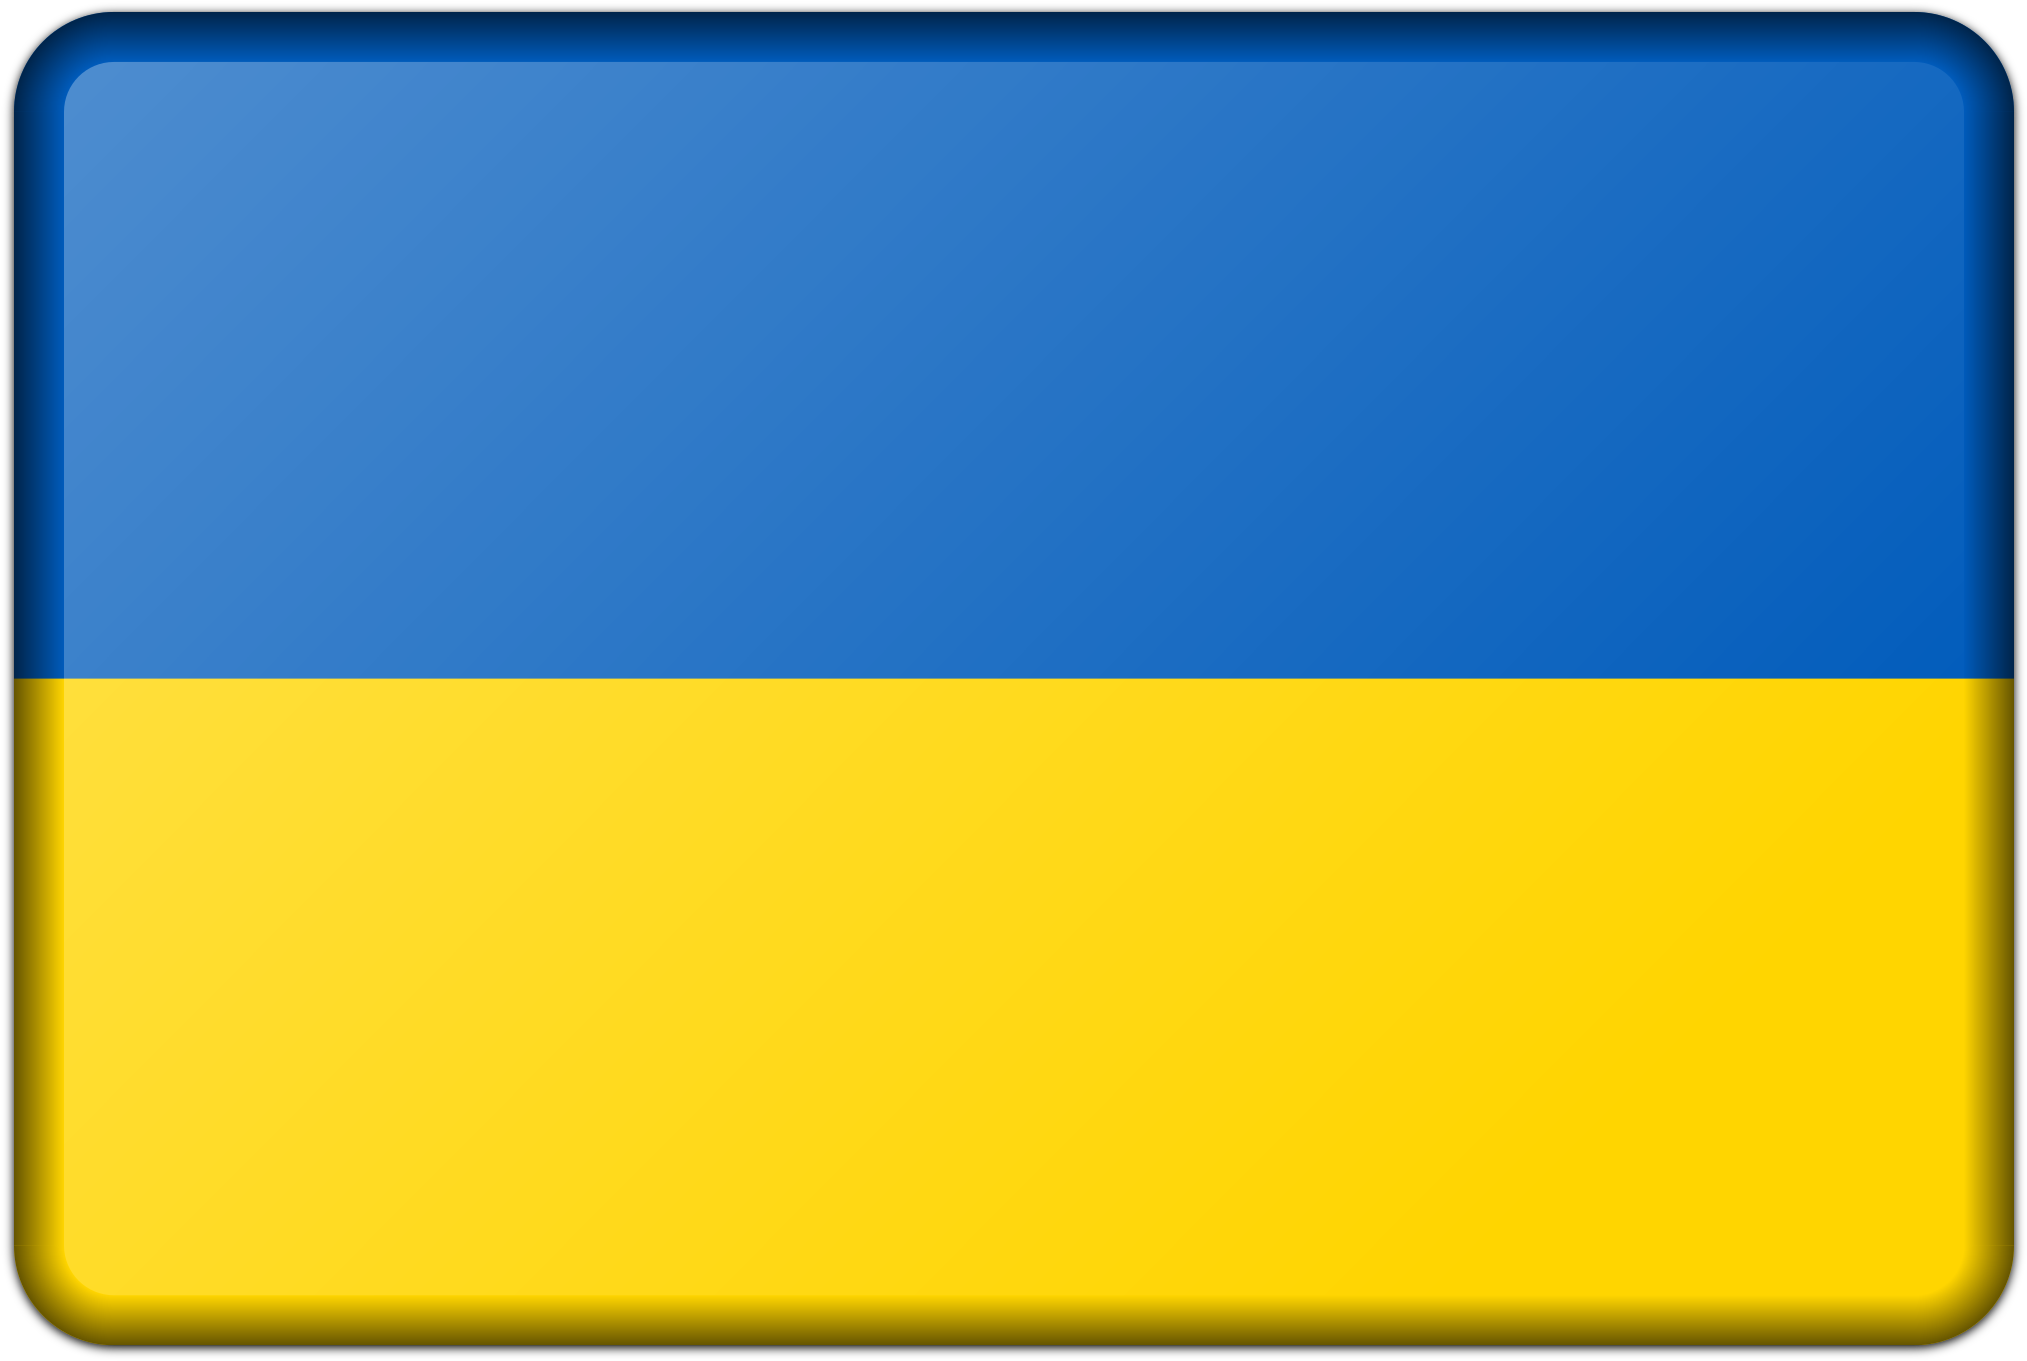 Картинка флаг украины маленький